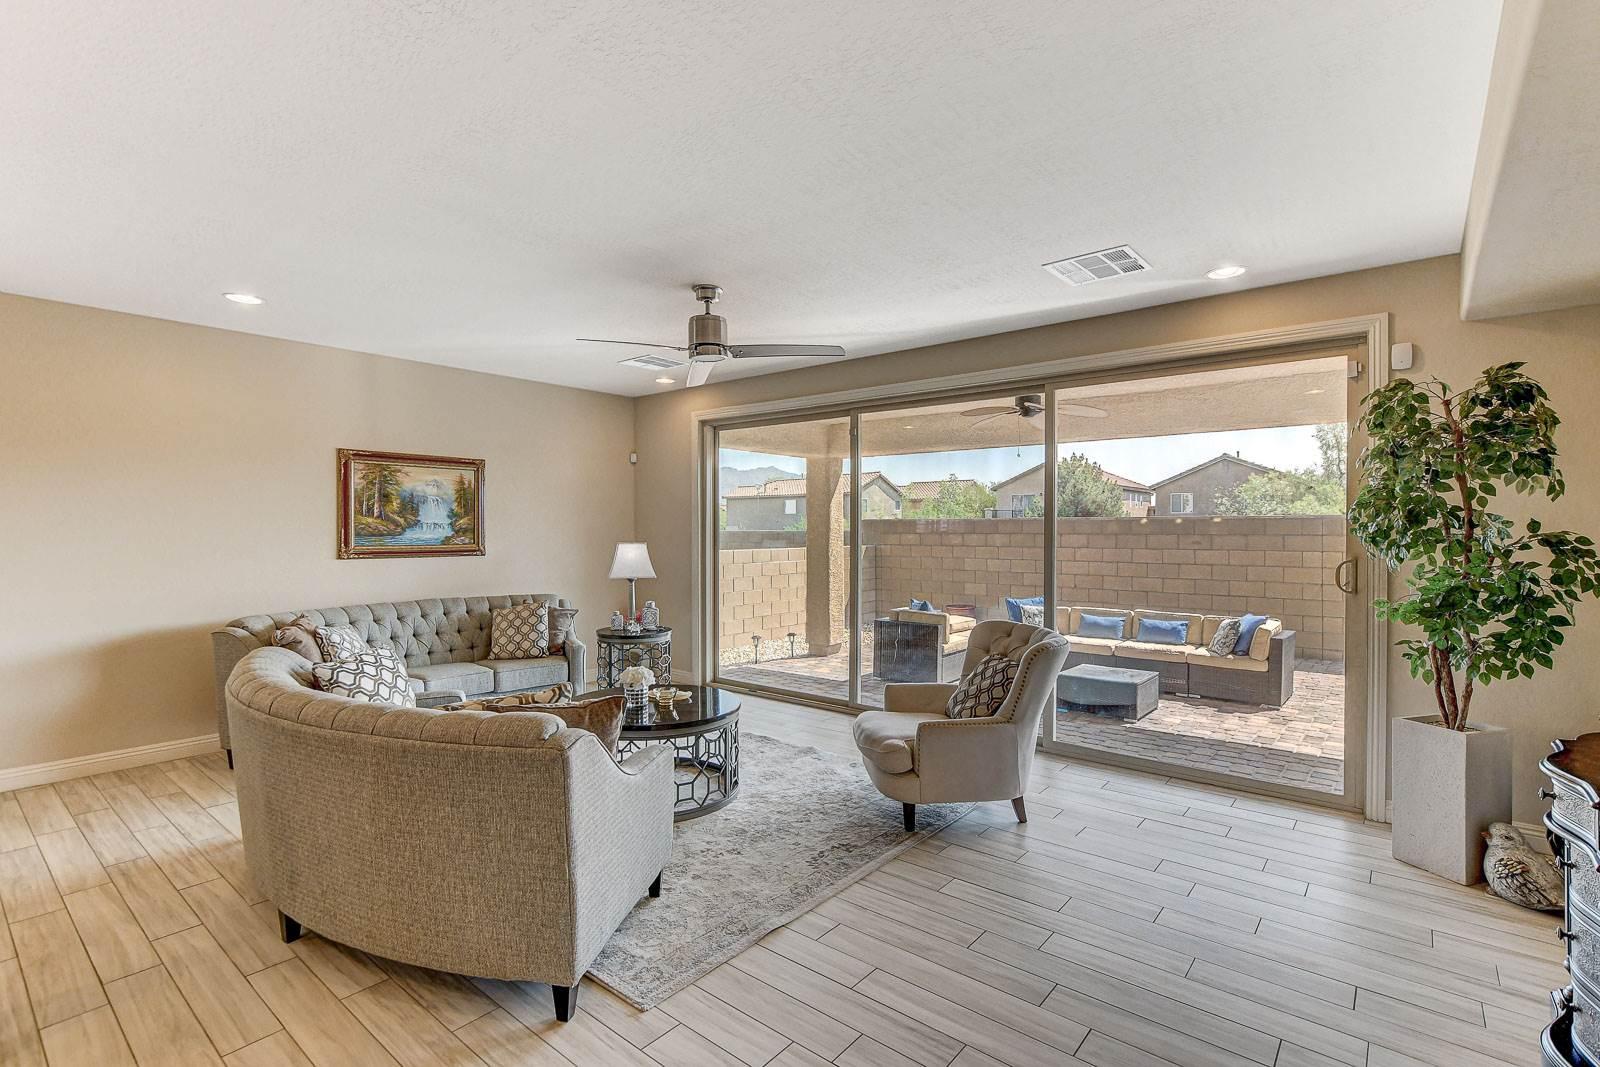 8124 Calico Bluffs Street, Las Vegas, NV 89166